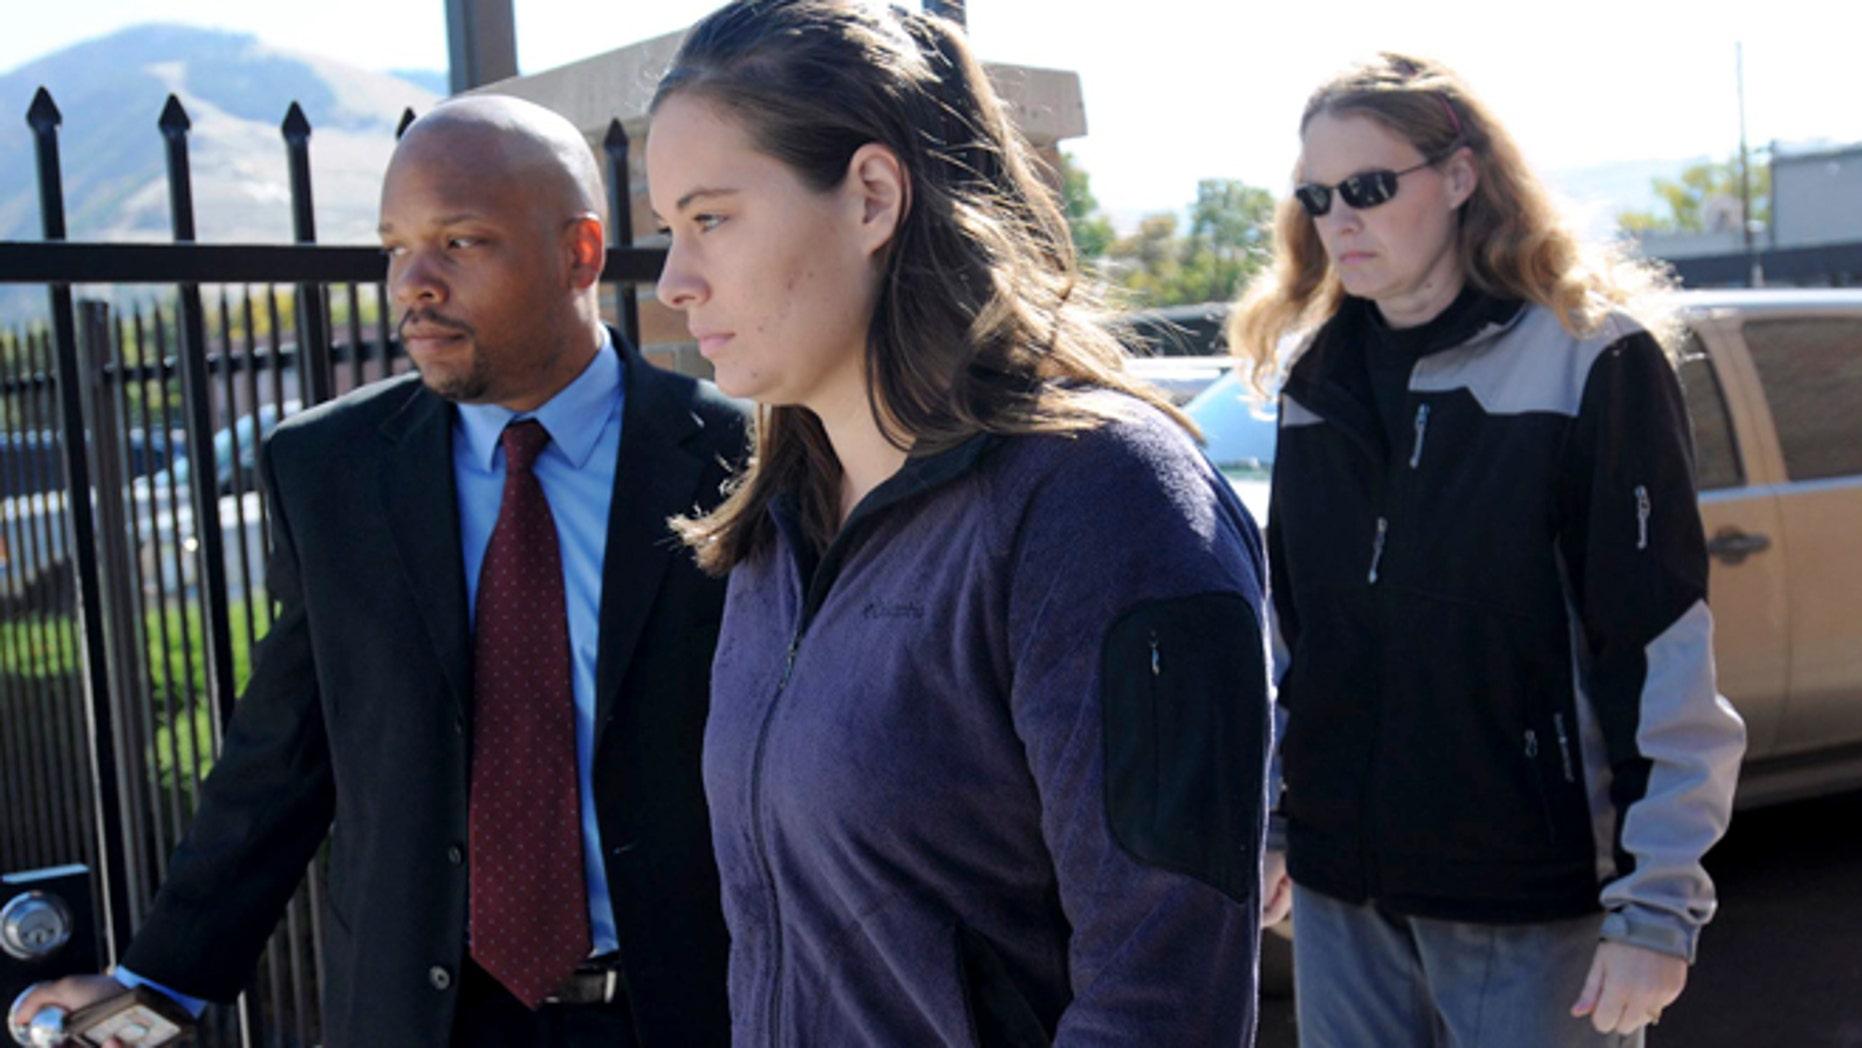 Oct. 4, 2013: In this file photo, Jordan Linn Graham, center, leaves federal court, in Missoula, Mont.